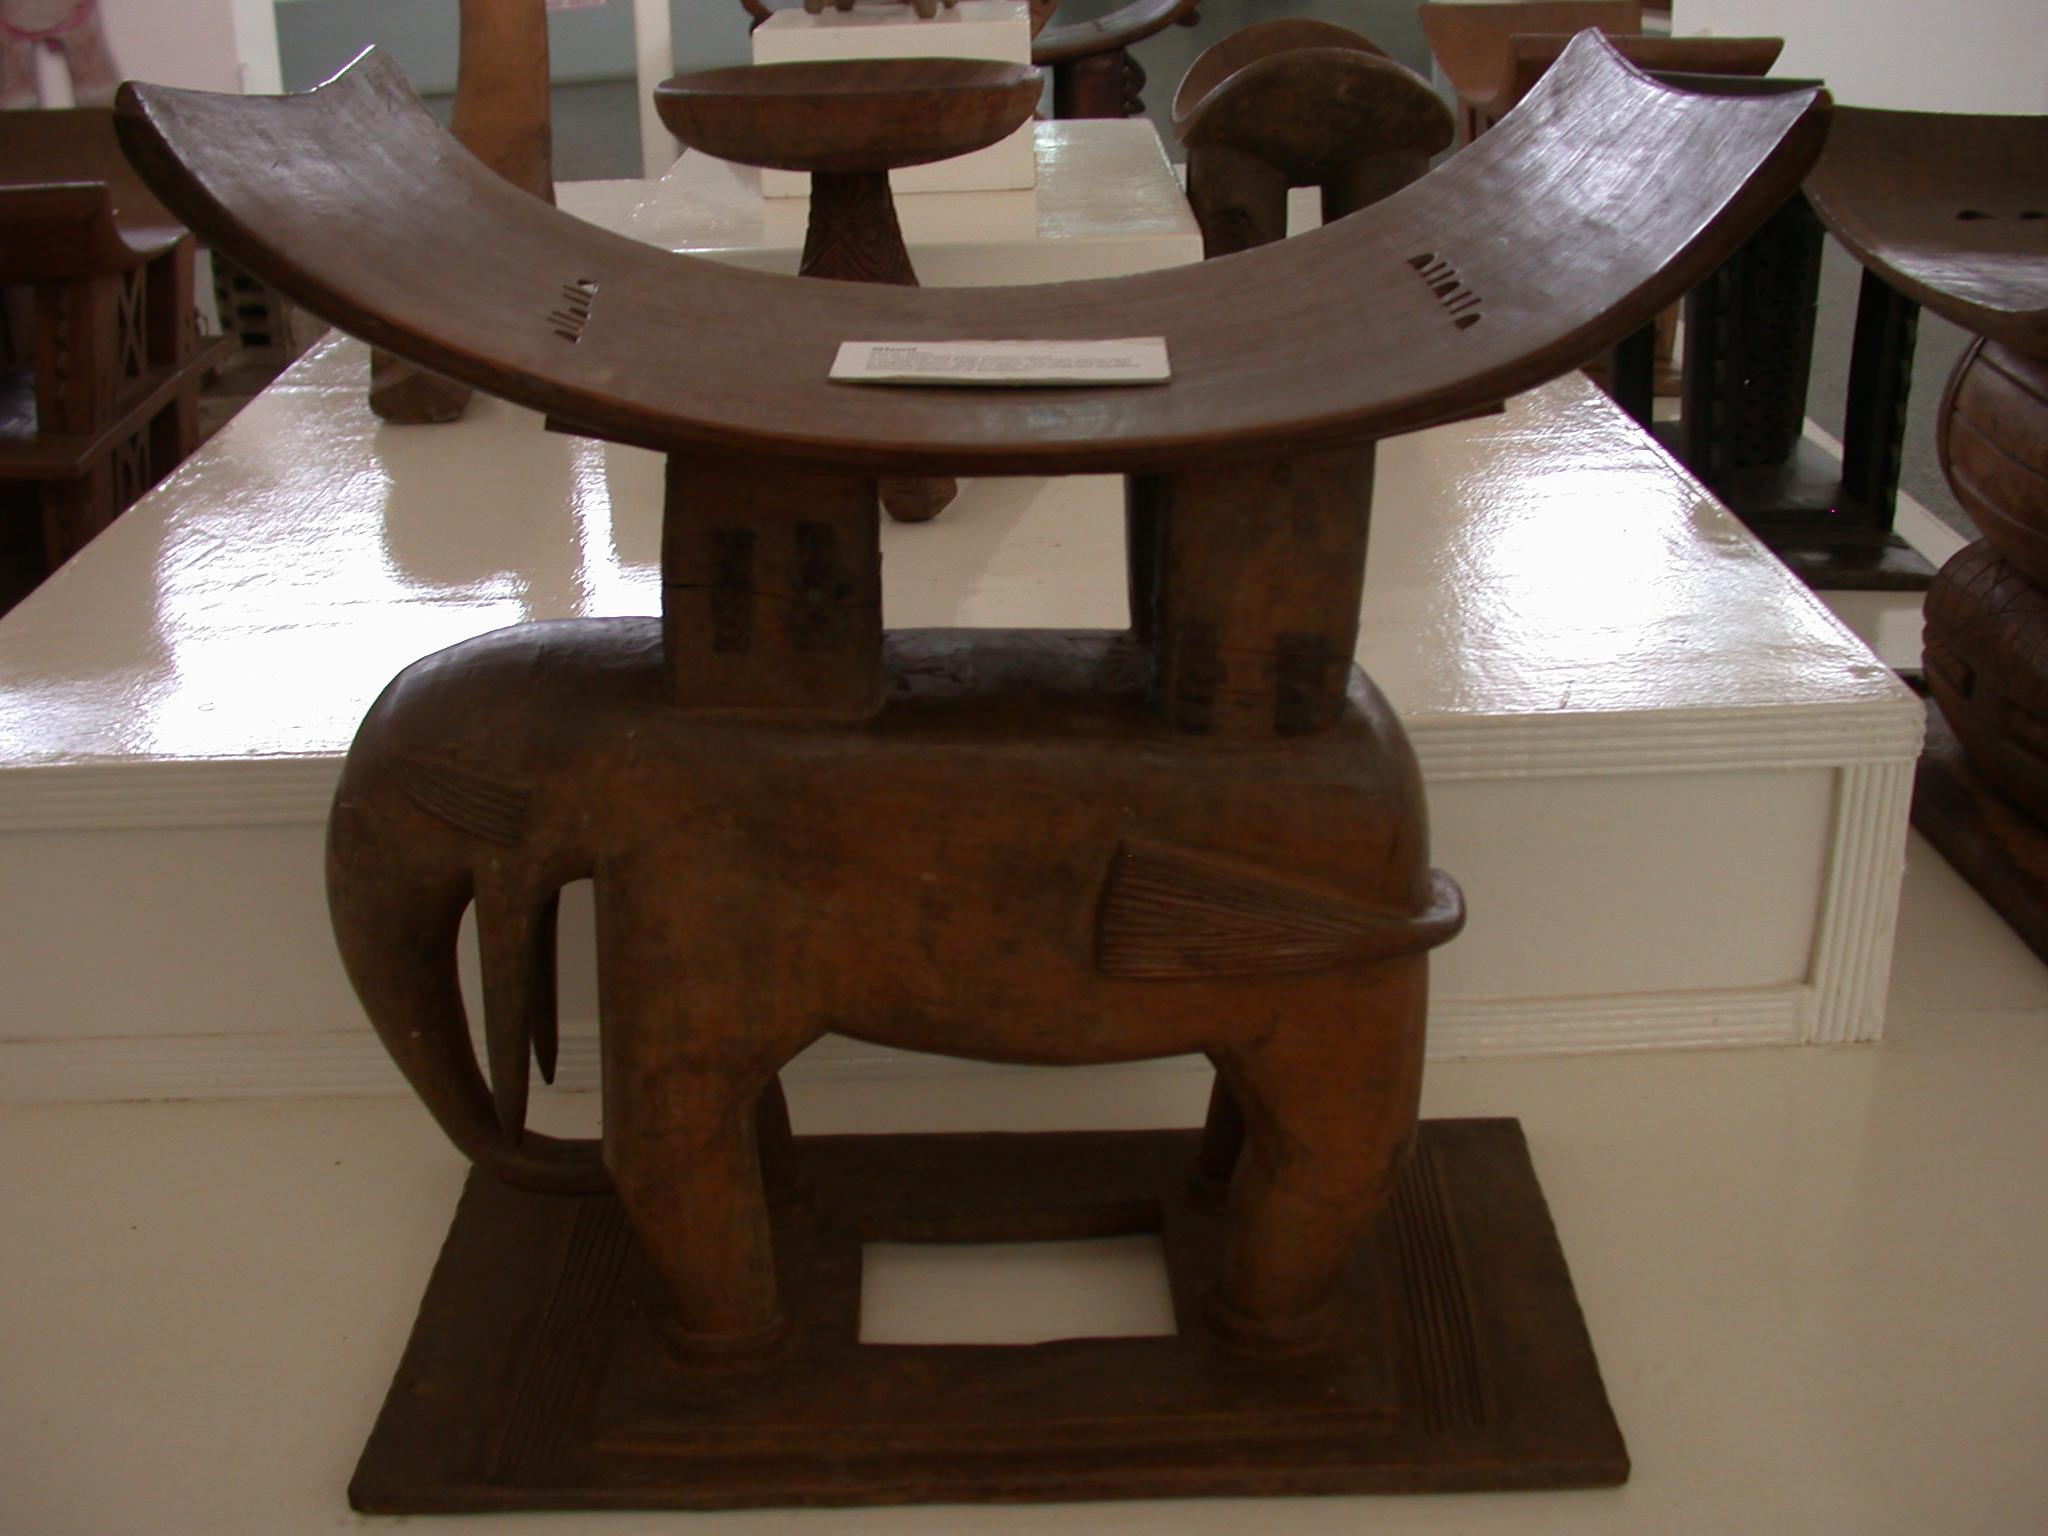 Akan Elephant Stool, National Museum, Accra, Ghana